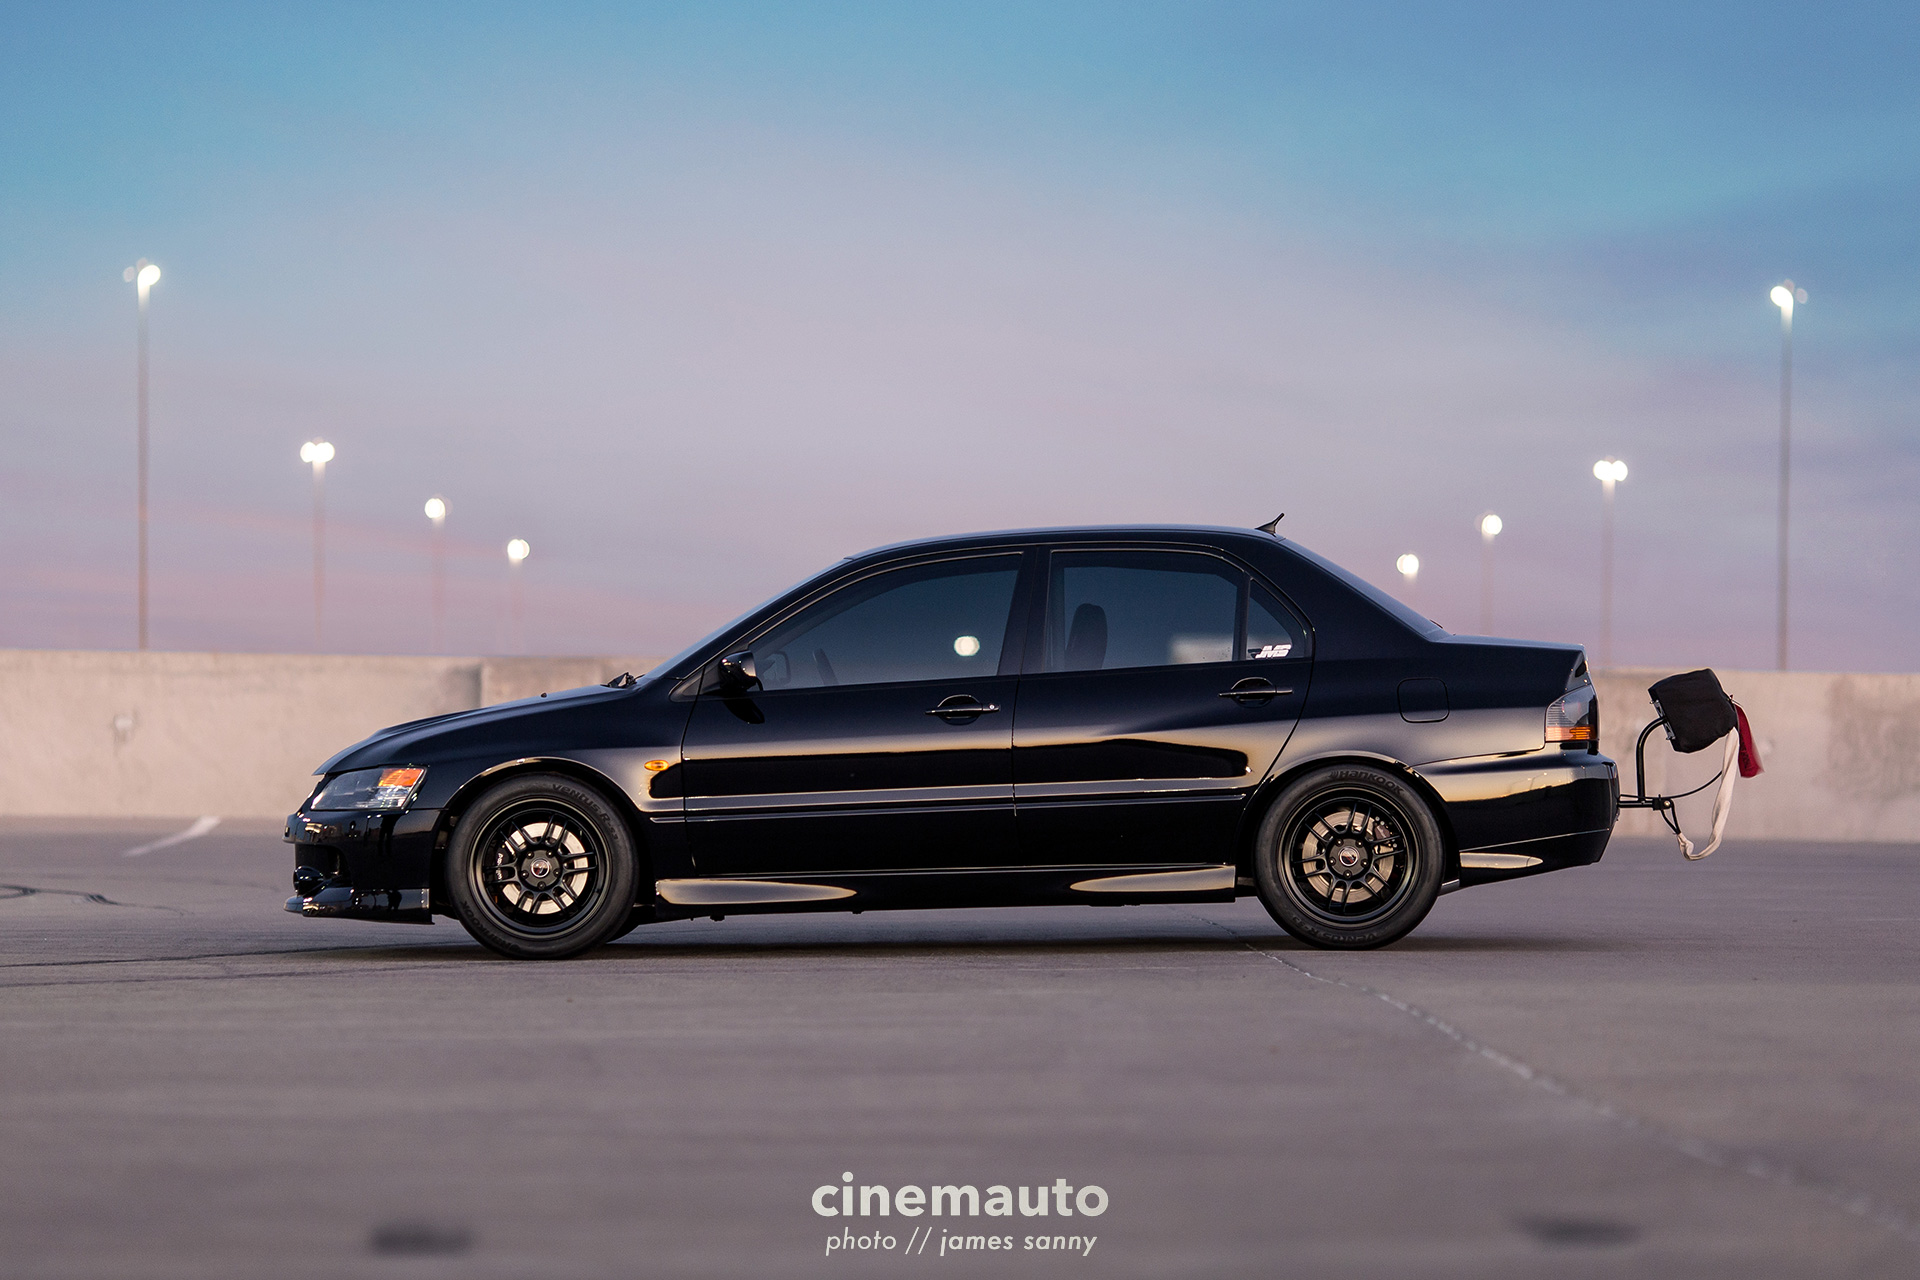 wichita-automotive-photographer-cinemauto-james-sanny-tj1sm.jpg